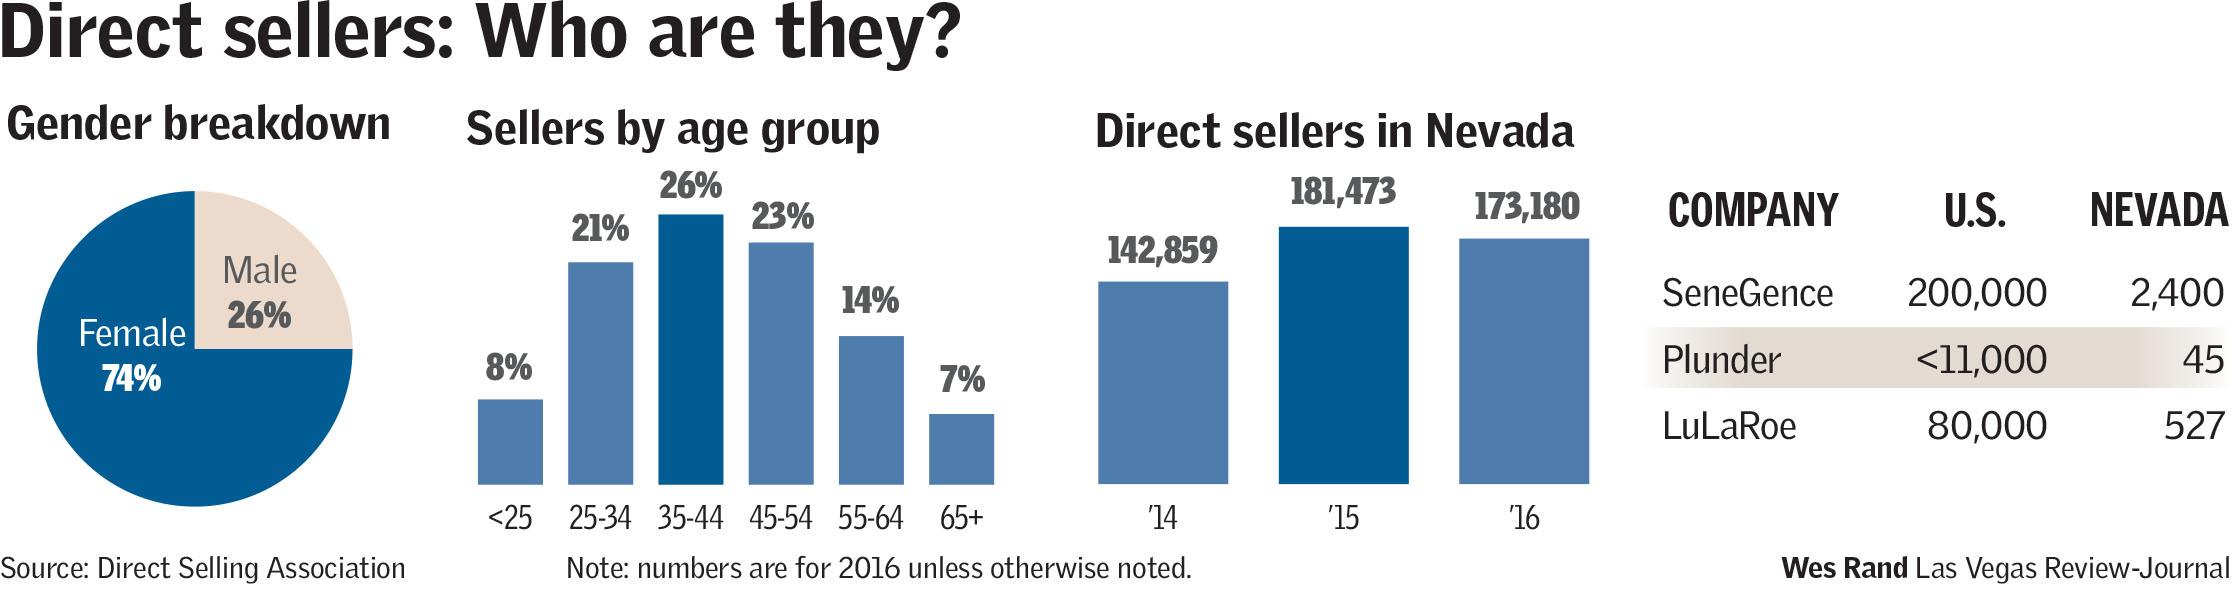 direct sellers graphic breakdown